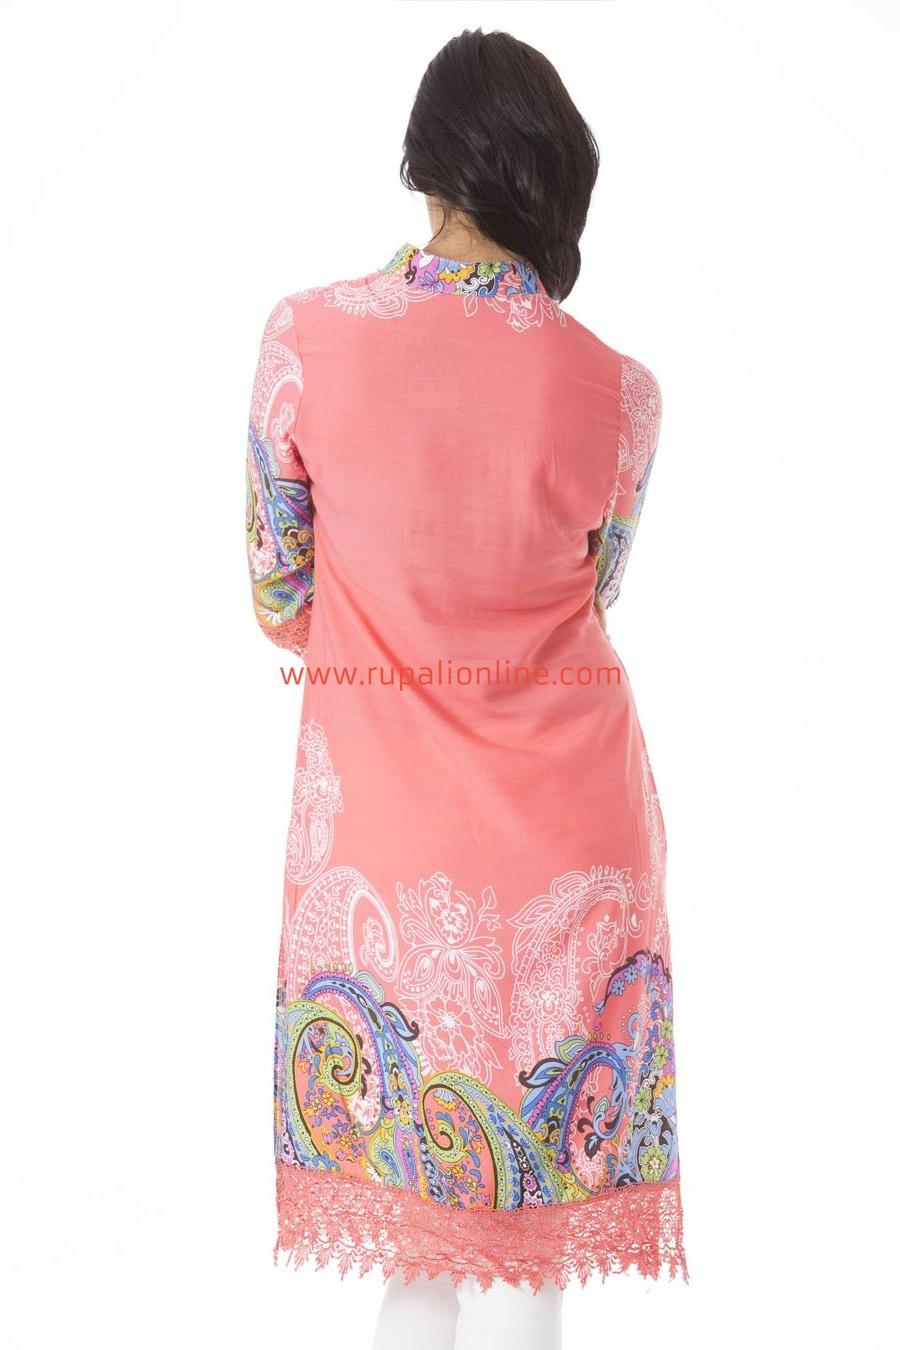 878c49b72 Buy an excelent range of Asian Womens kaftans , Sarees, Salwar Kameez,  Churidar and Trouser Suits. Kaftans, Bridal Saree, Asian womens Clothes  from Rupali ...